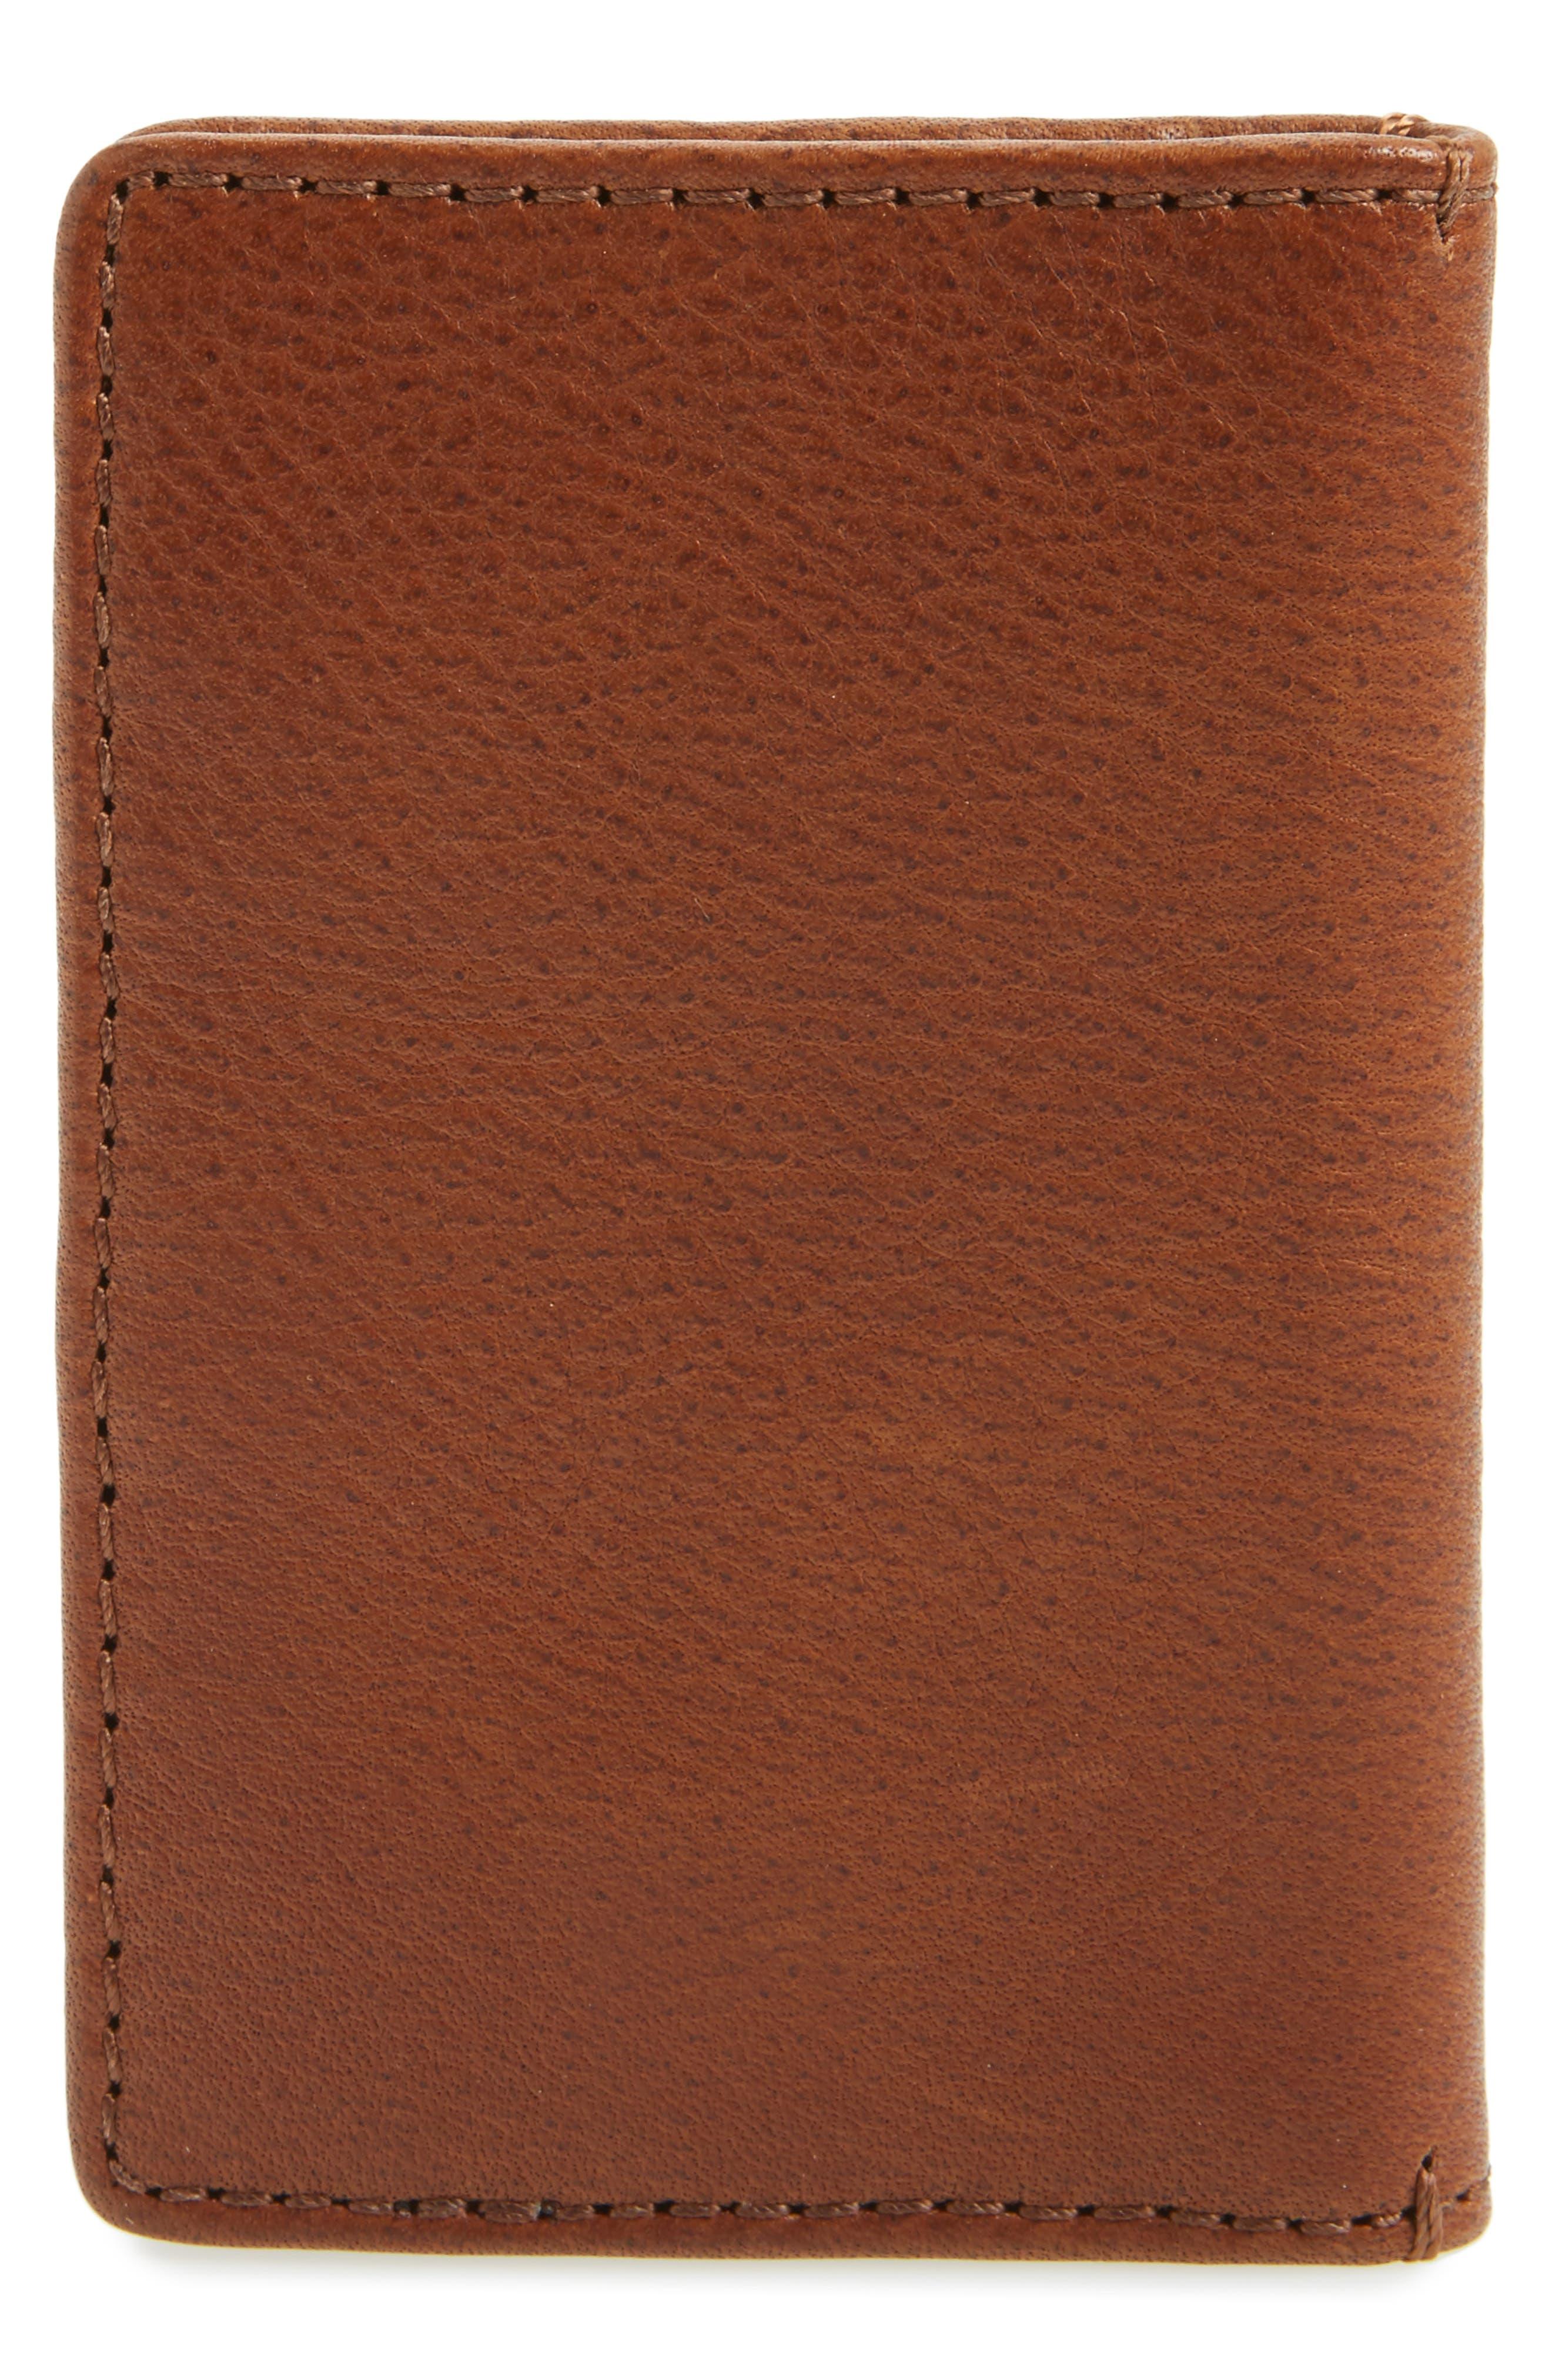 Oliver Leather Wallet,                             Alternate thumbnail 3, color,                             Cognac